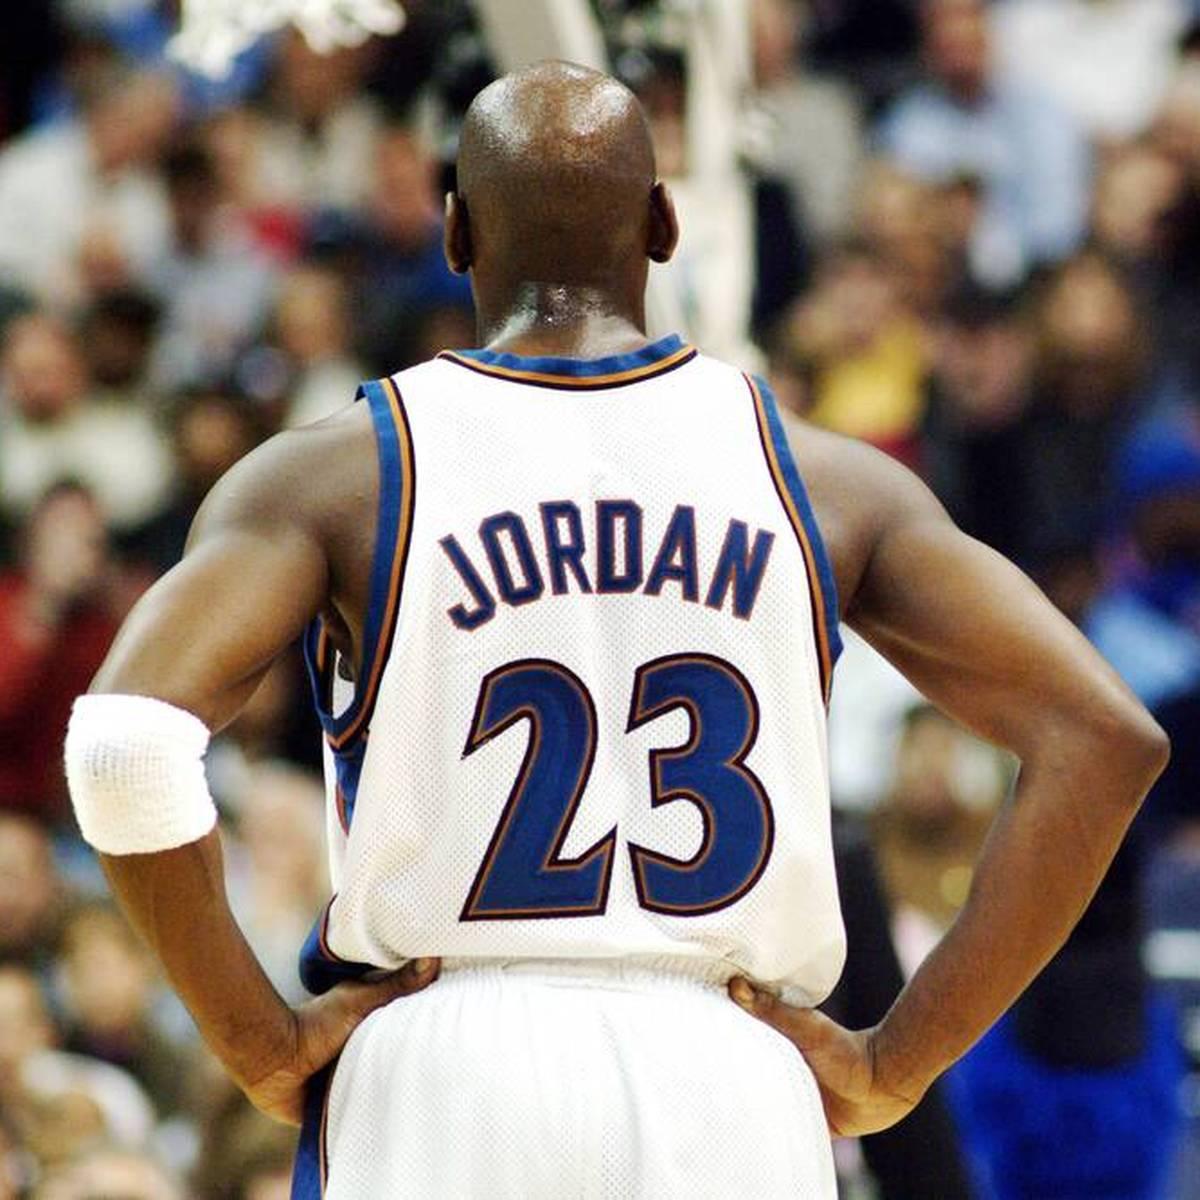 Dieser Jordan-Hammer spaltet die Basketball-Welt bis heute